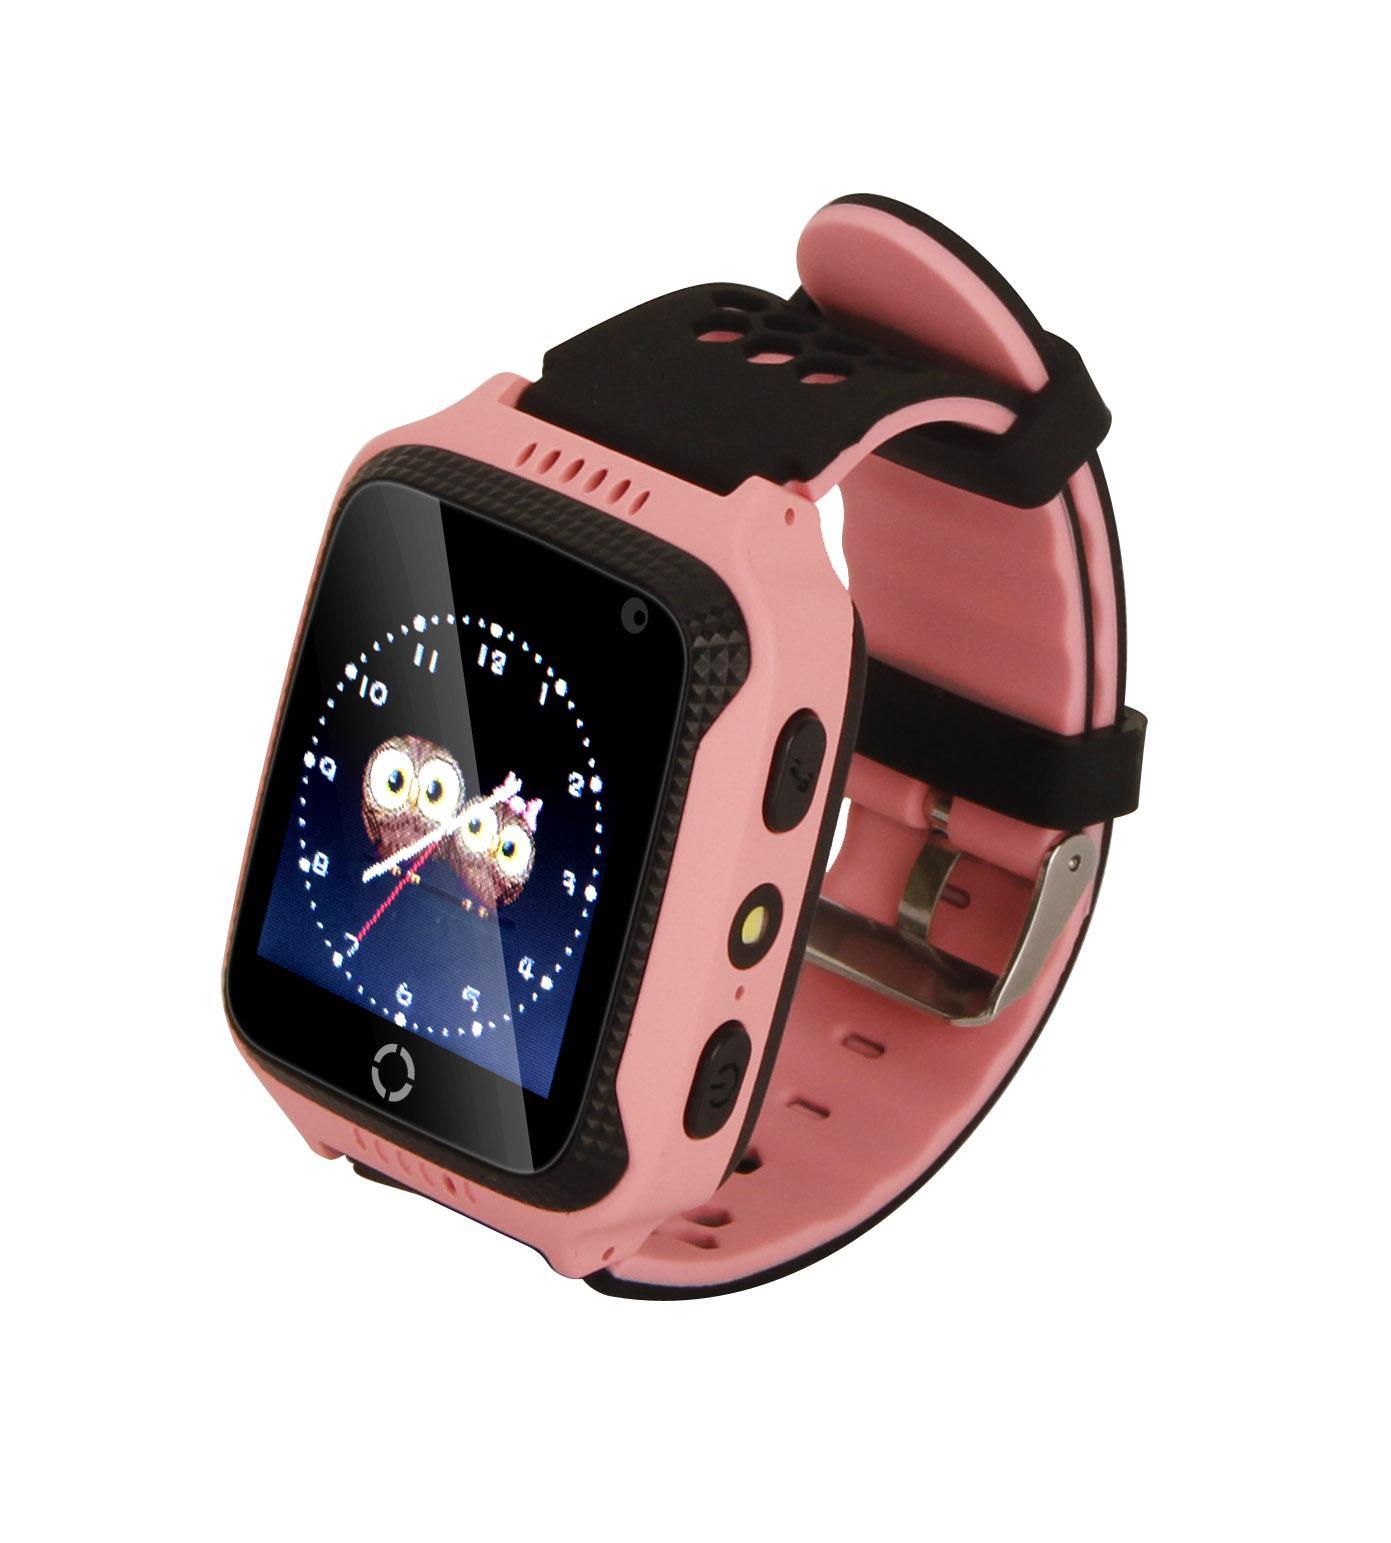 贝贝优可儿童智能GPS定位手表宝宝礼物W4 1